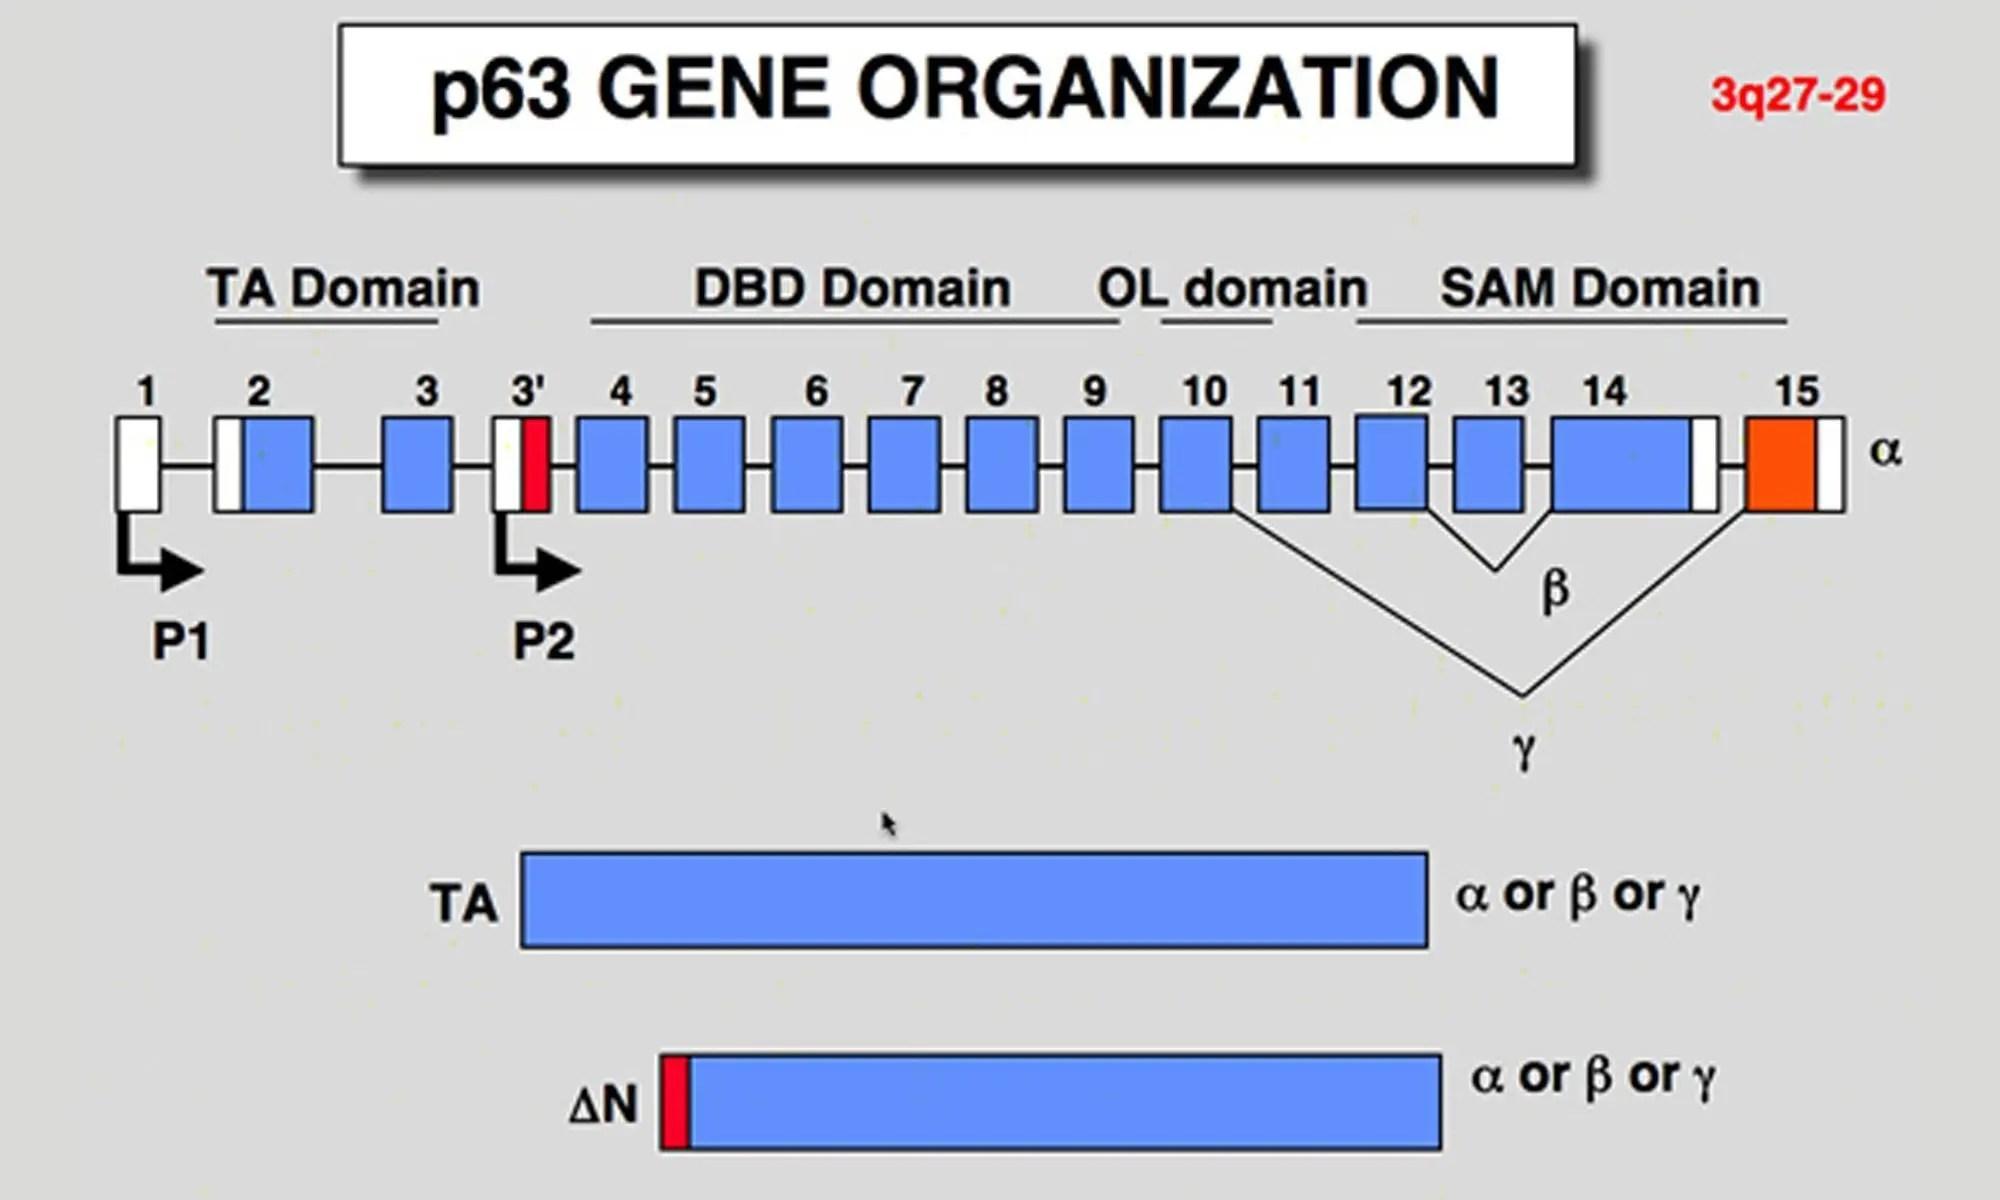 image of p63 gene